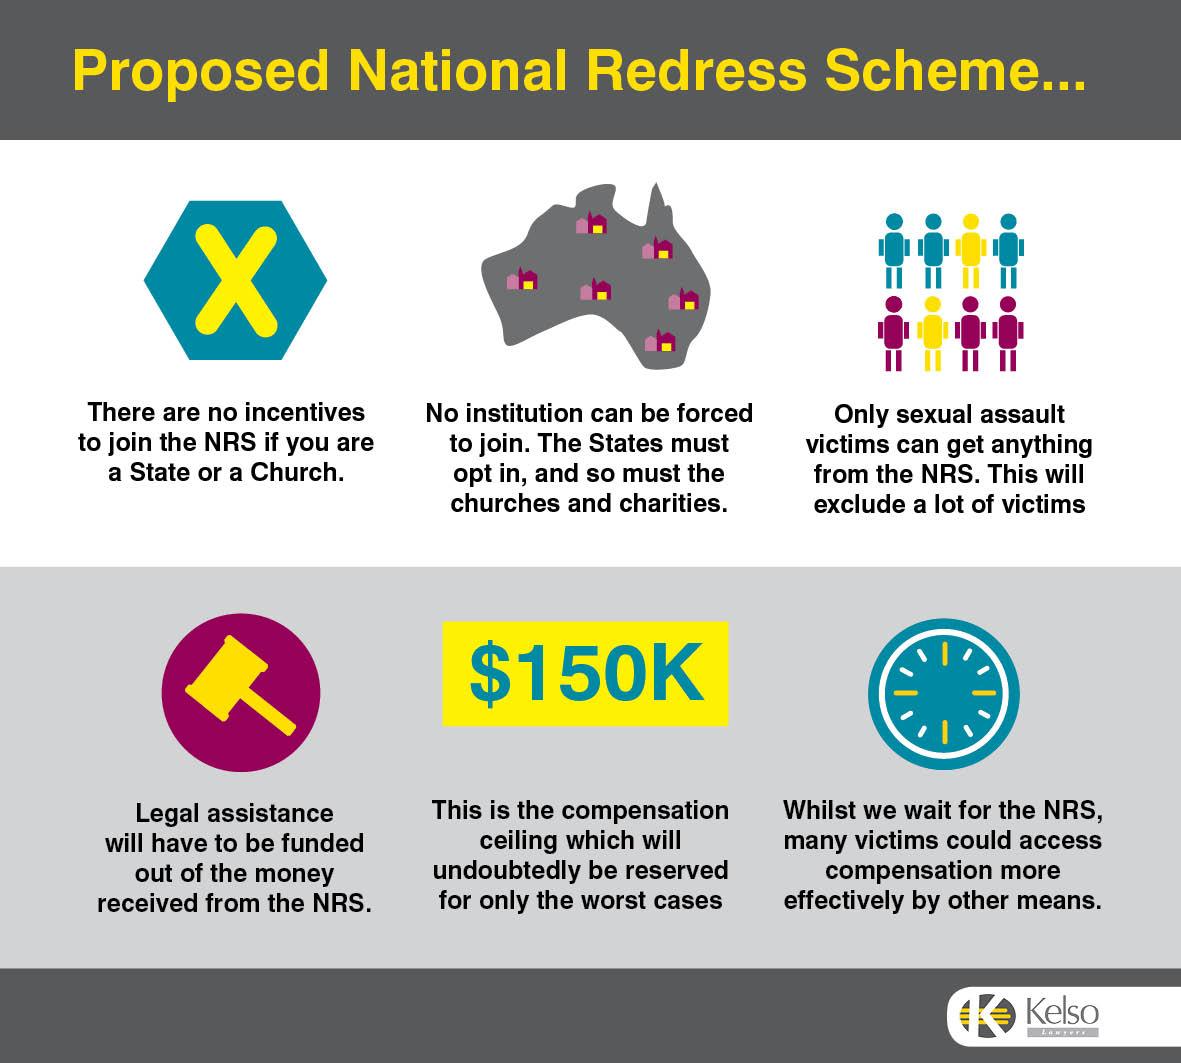 National Redress Scheme Australia